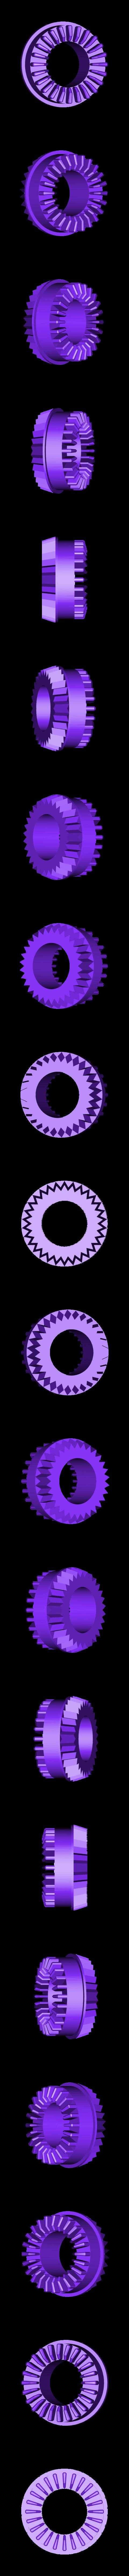 46131e58 74f2 459d b682 fd81f39b6cb8